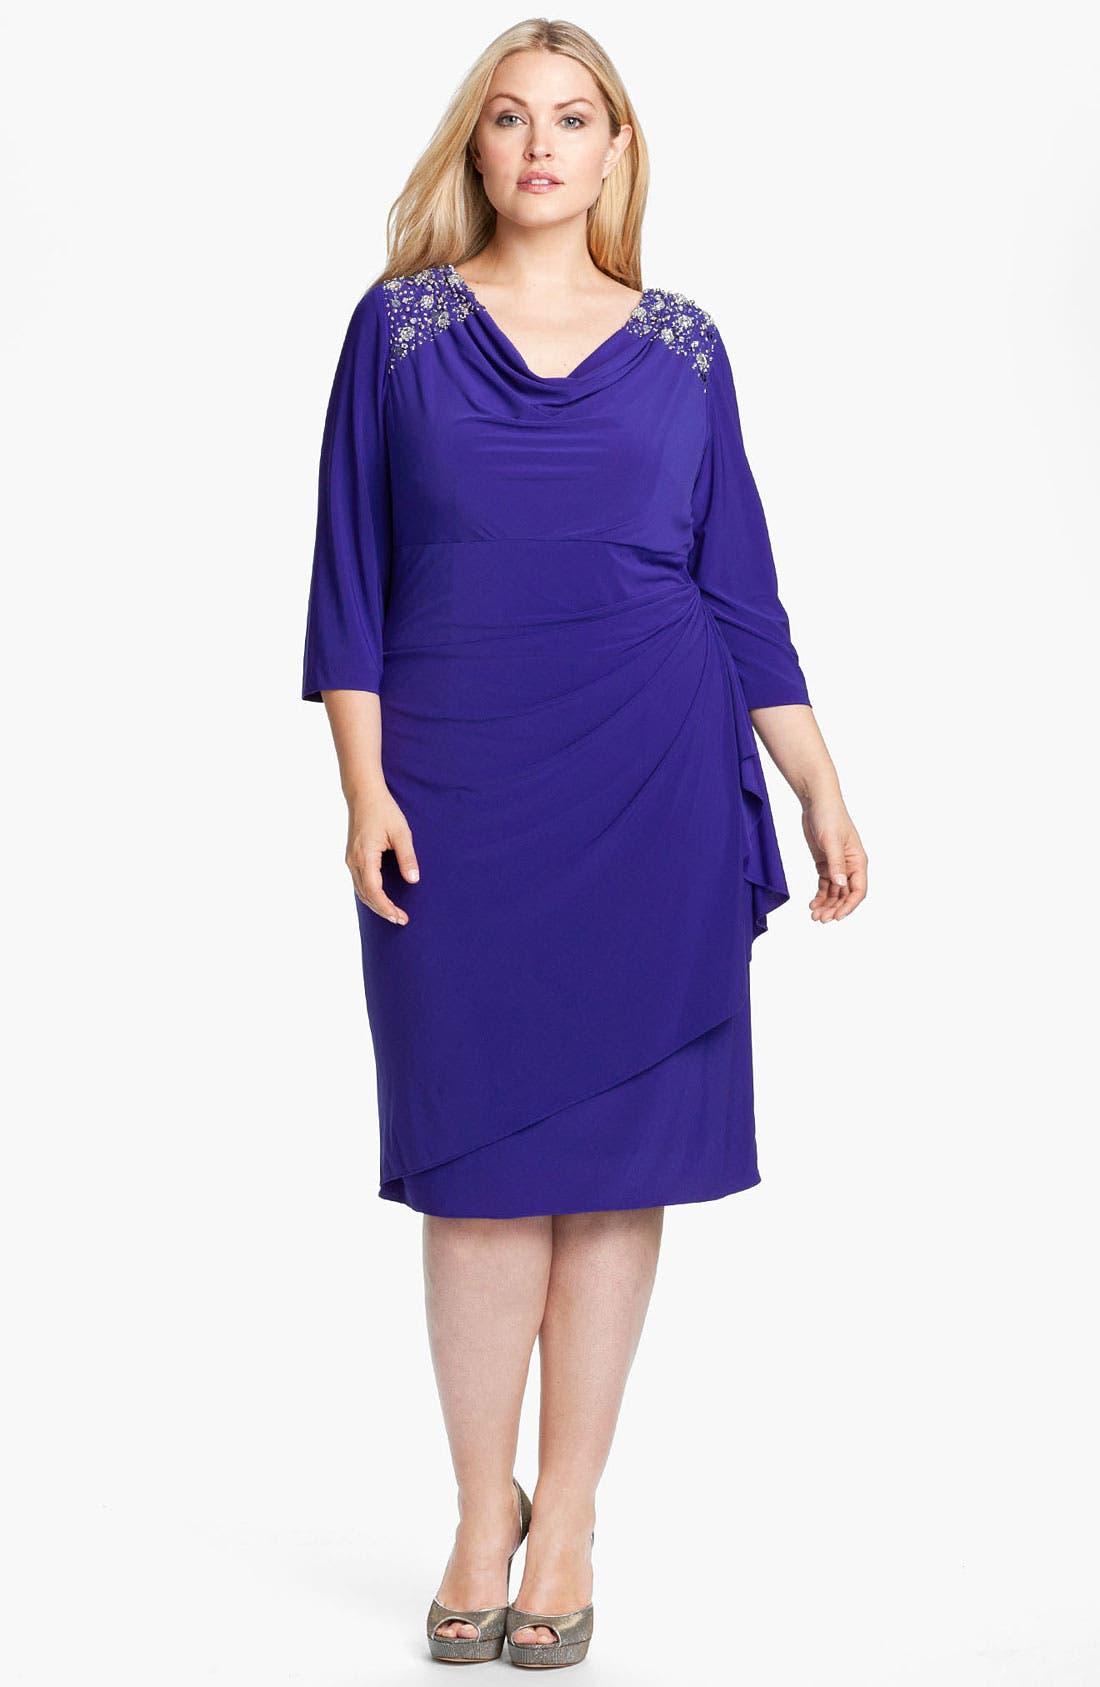 Alternate Image 1 Selected - Alex Evenings Jeweled Faux Wrap Matte Jersey Dress (Plus)